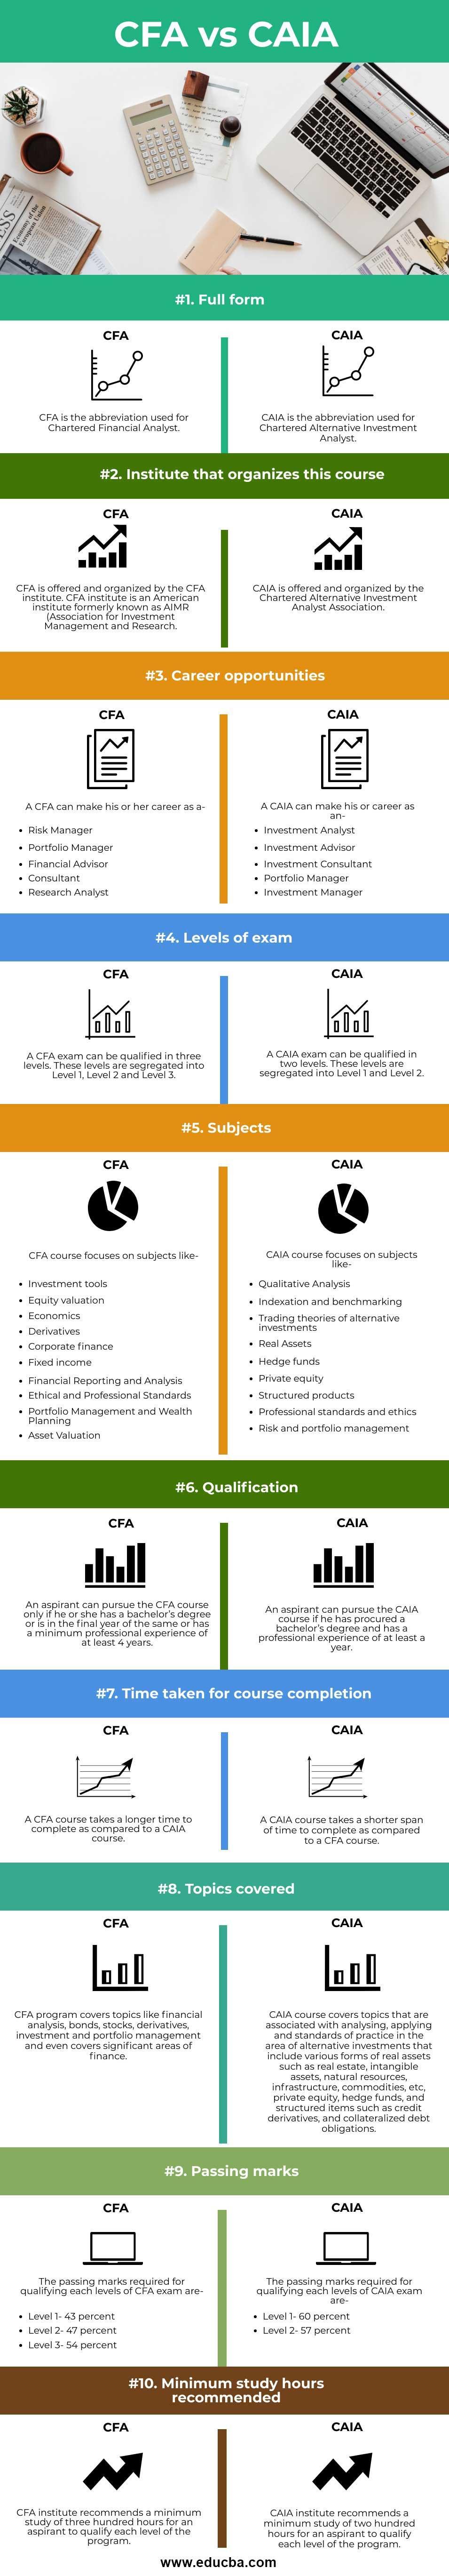 Cfa Vs Caia Top 10 Differences To